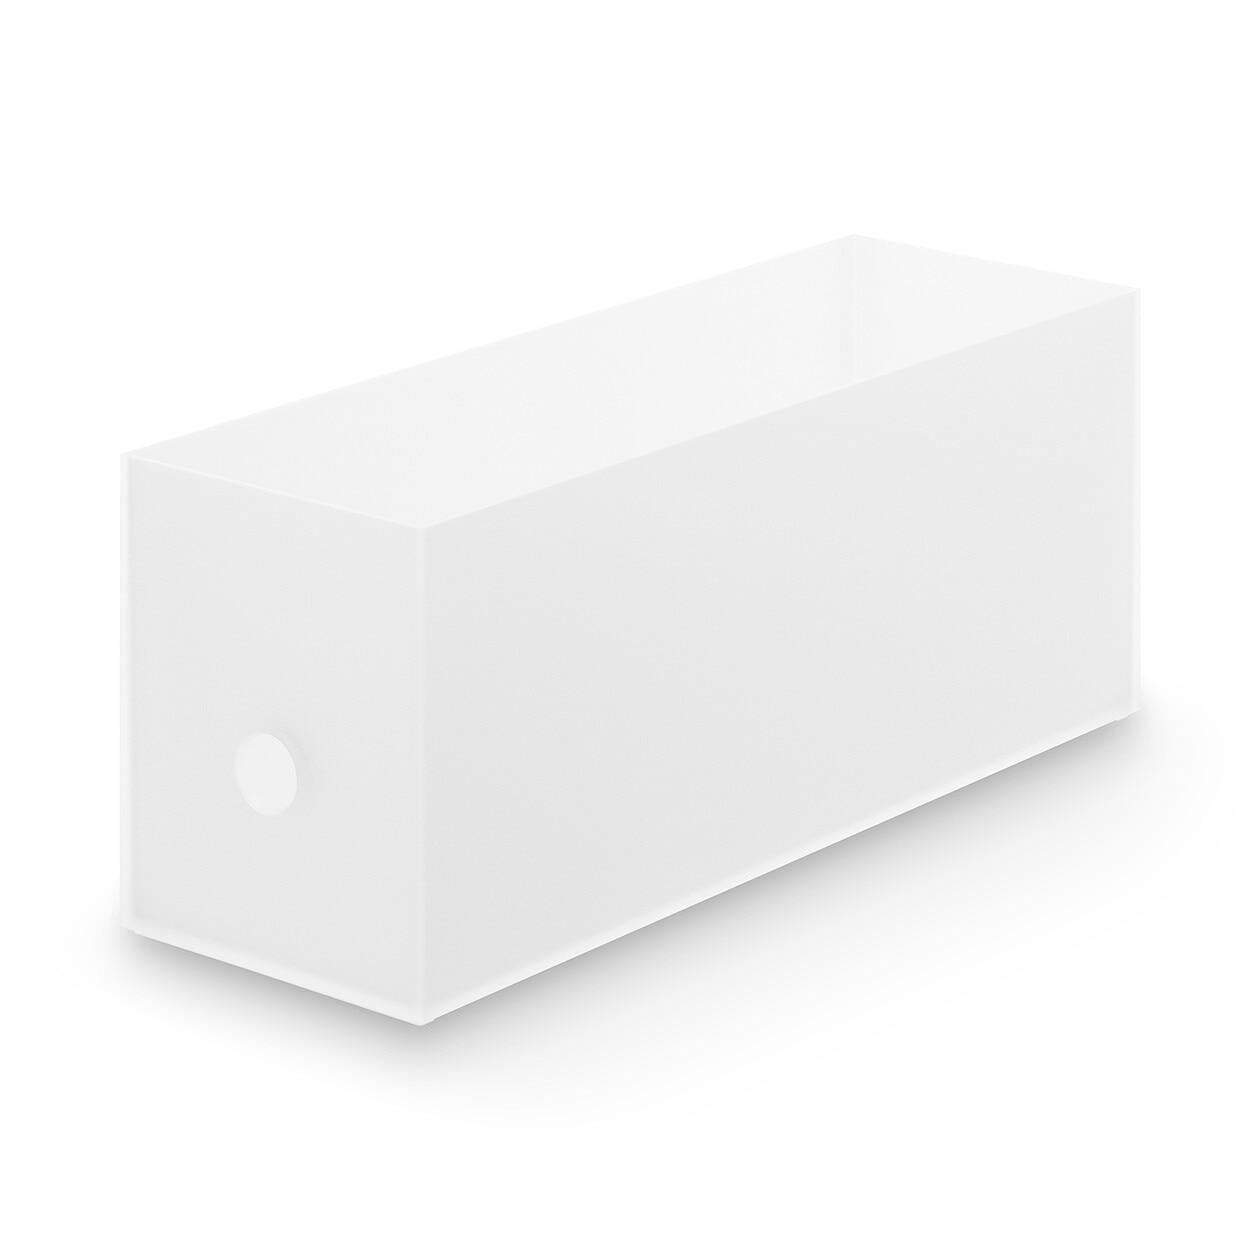 RoomClip商品情報 - ポリプロピレンファイルボックス・スタンダードタイプ・1/2